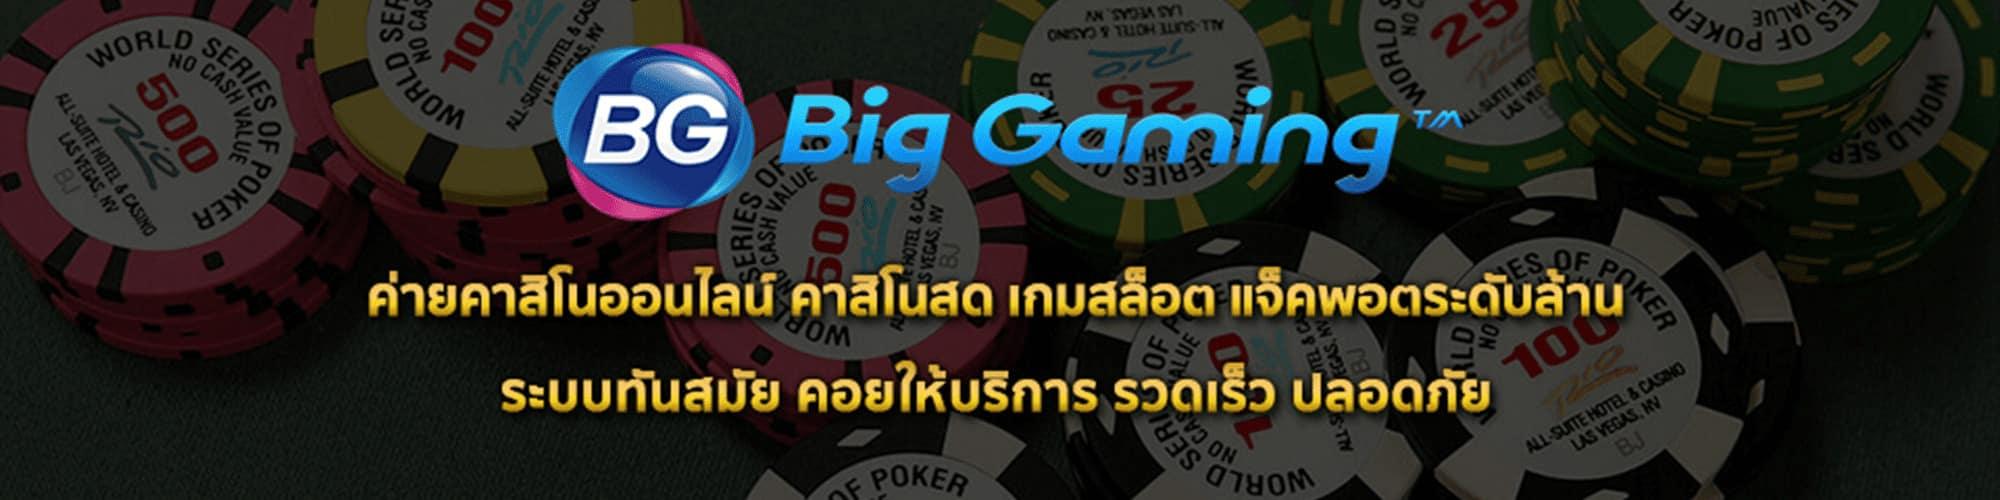 Big Gaming ปก3.jpg